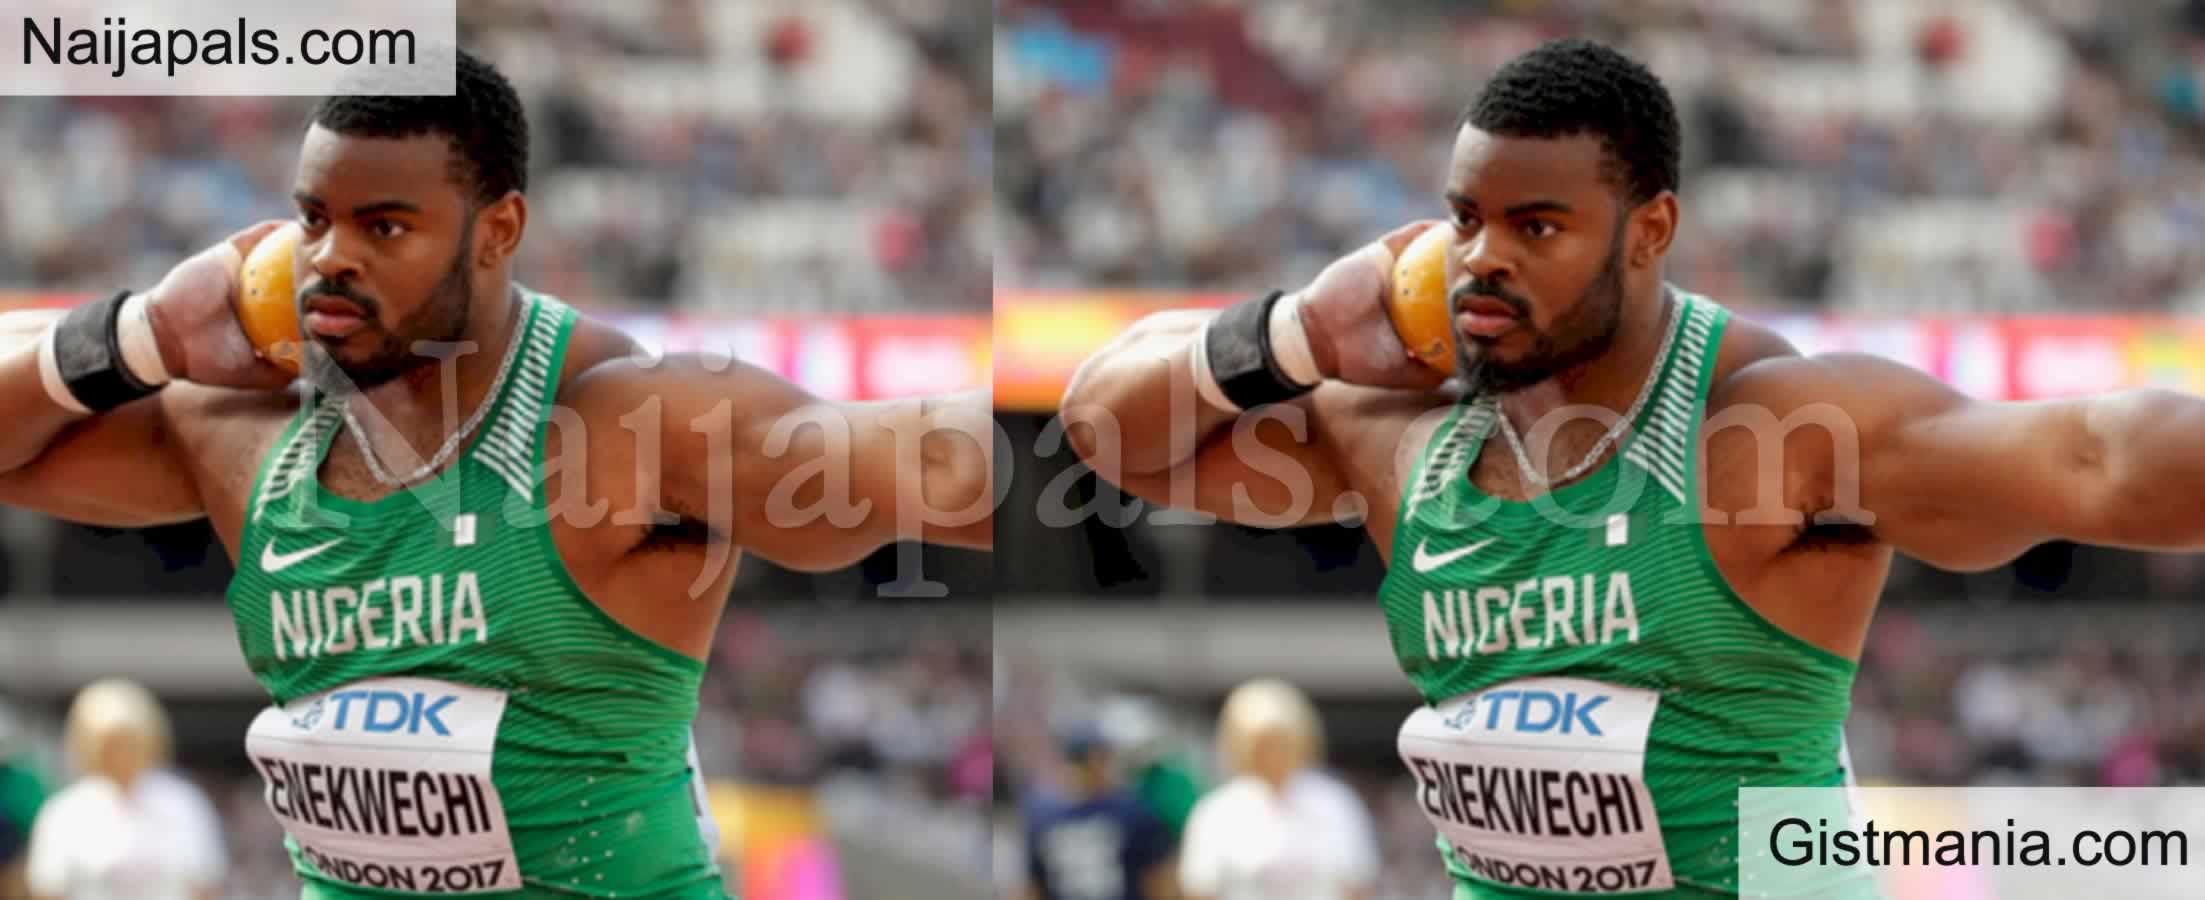 <img alt='.' class='lazyload' data-src='https://img.gistmania.com/emot/comment.gif' /> <b>Tokyo Olympics: 28-Year-Old Nigeria's Enekwechi Qualifies For Men's Shot Put Final</b>